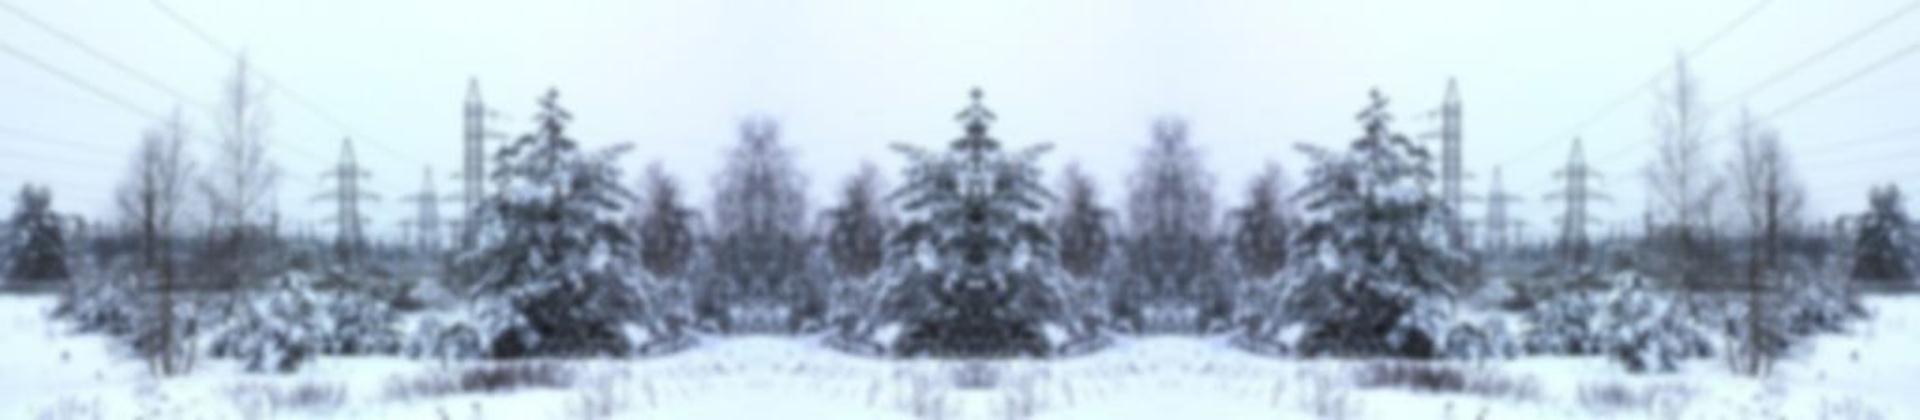 zastavka-zima